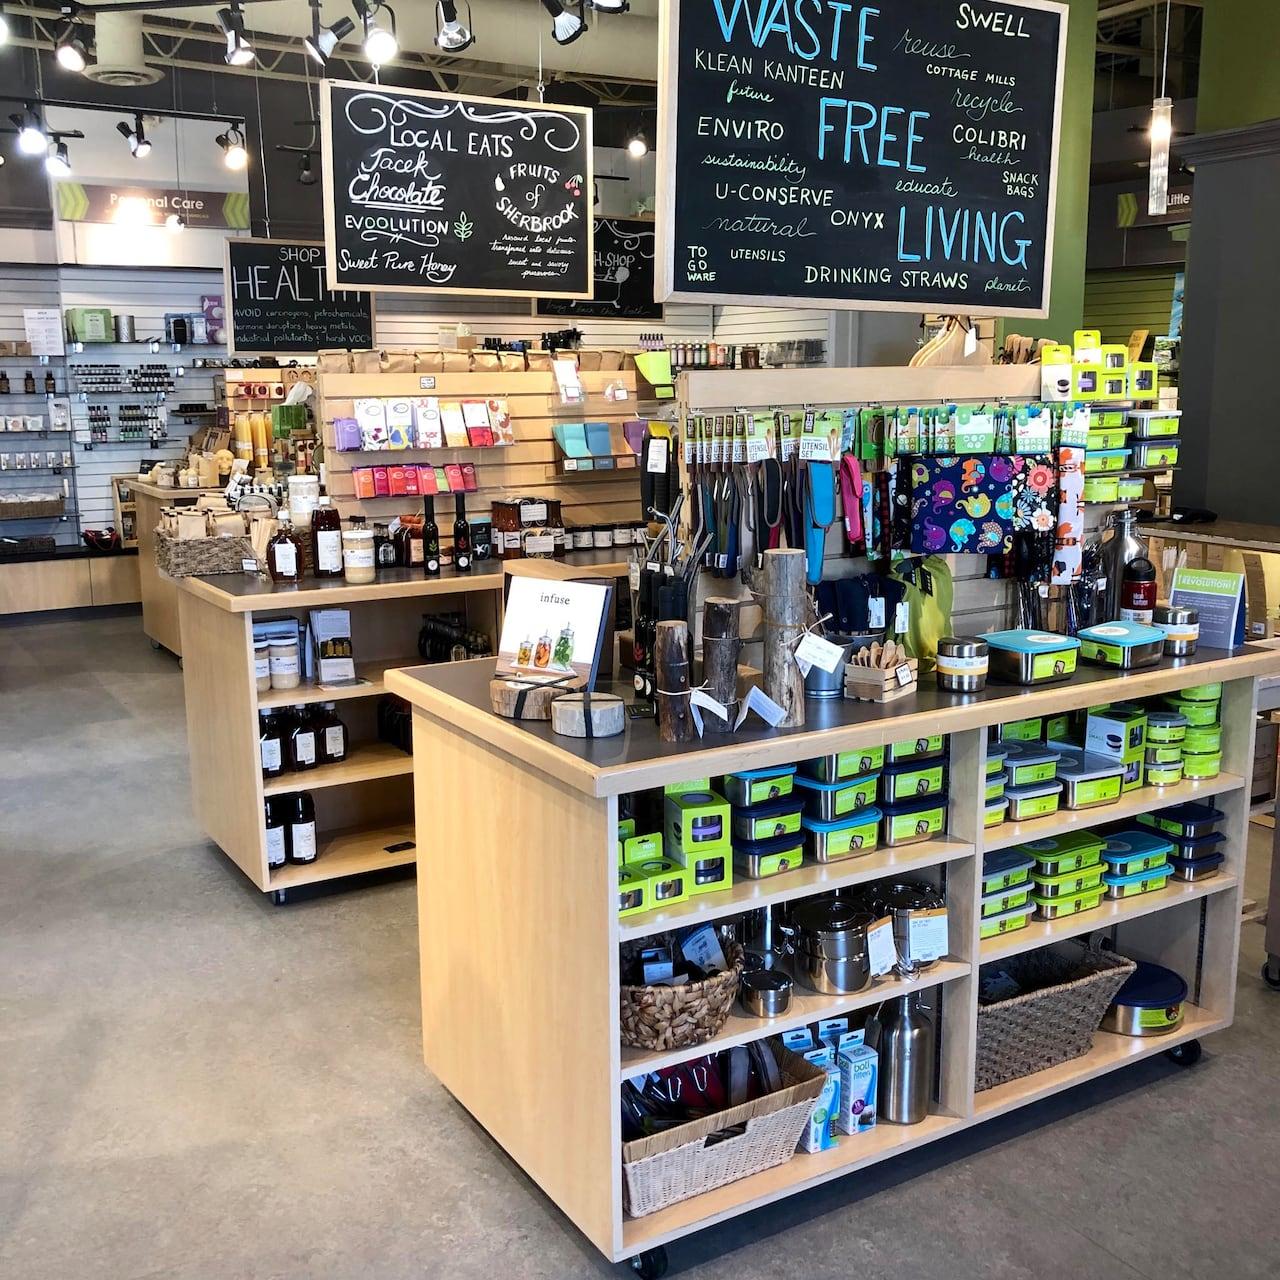 Edmonton businesses keen on single-use plastic ban, but wary